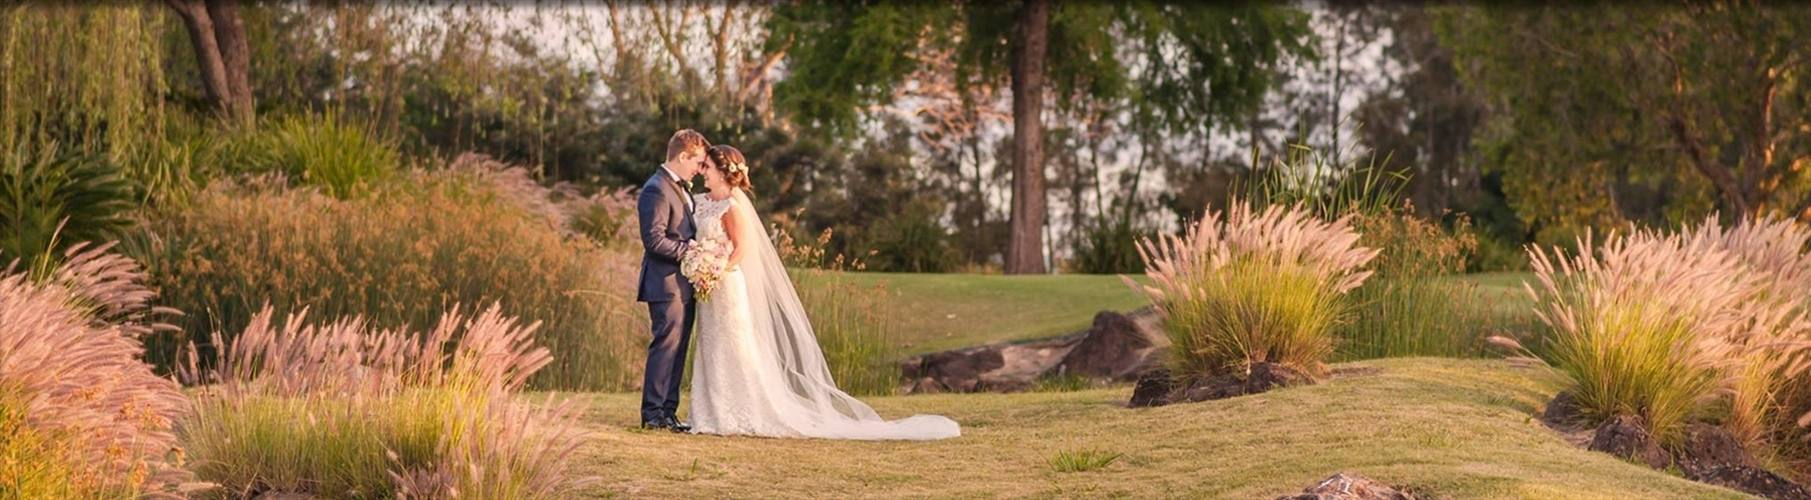 Wedding Venue - Lakelands Golf Club 11 on Veilability